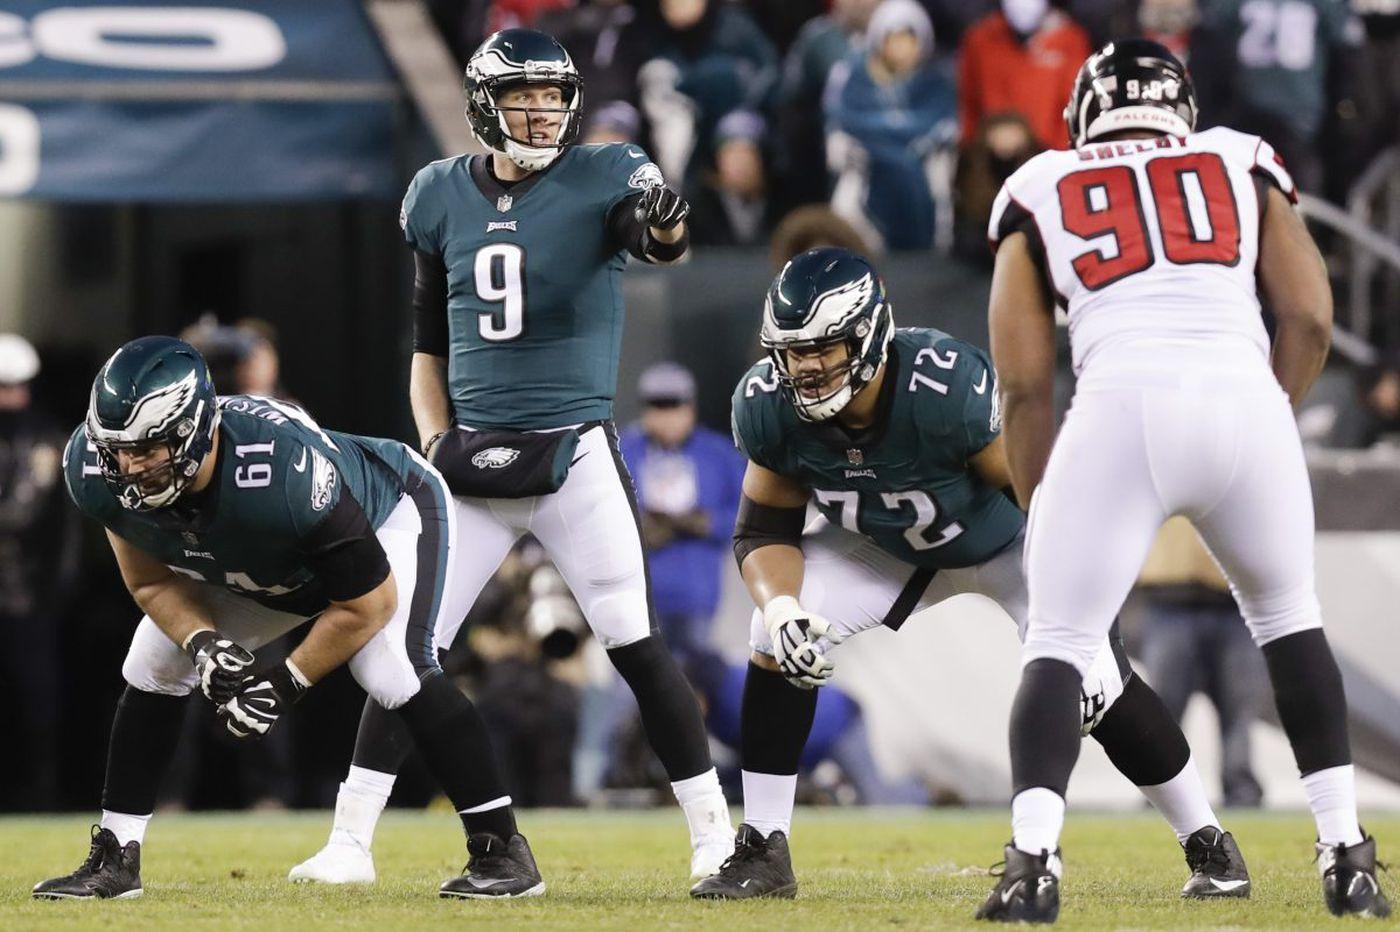 Eagles-Vikings: Key pregame statistics to know | Paul Domowitch